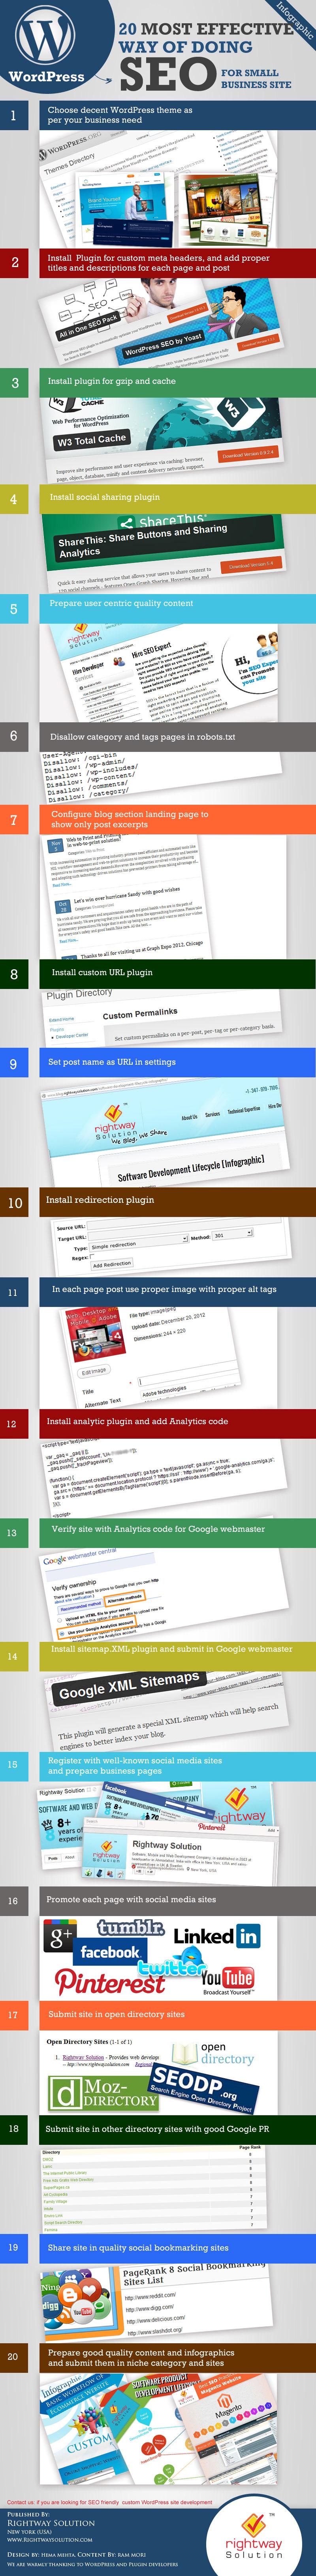 wordpress-marketing-tips